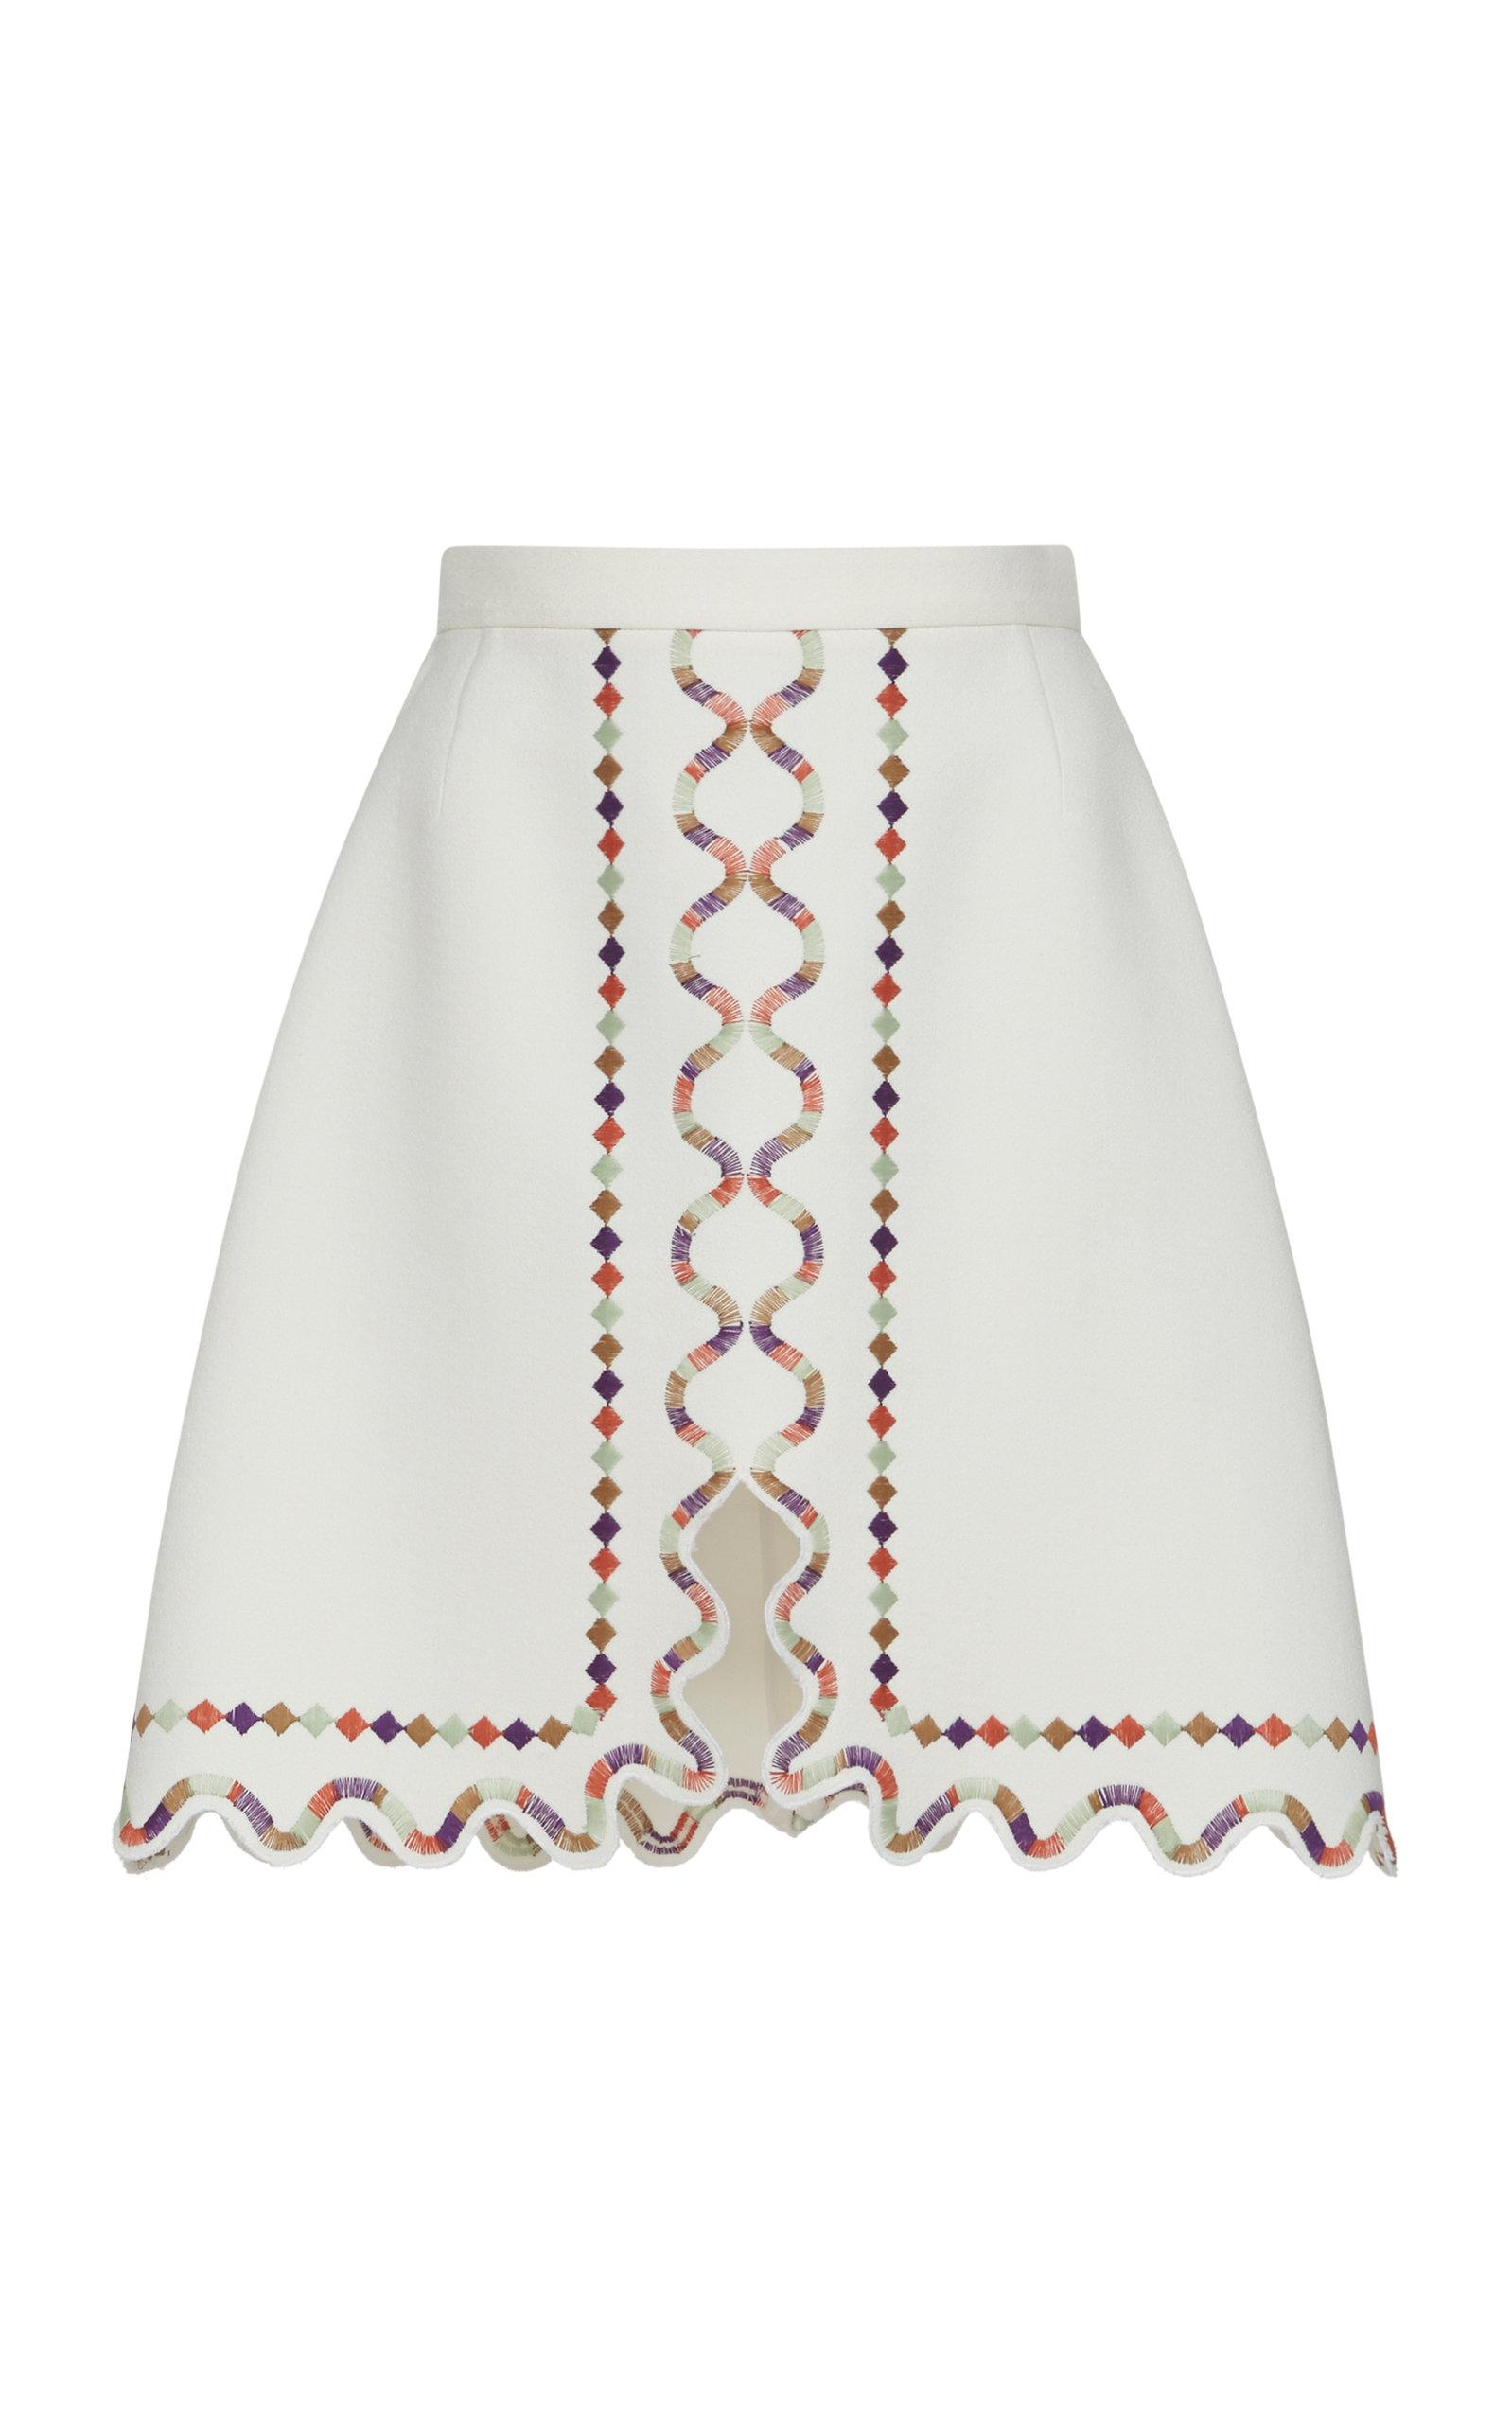 5261fce3fe Giambattista Valli Embroidered Crepe Mini Skirt in White - Lyst